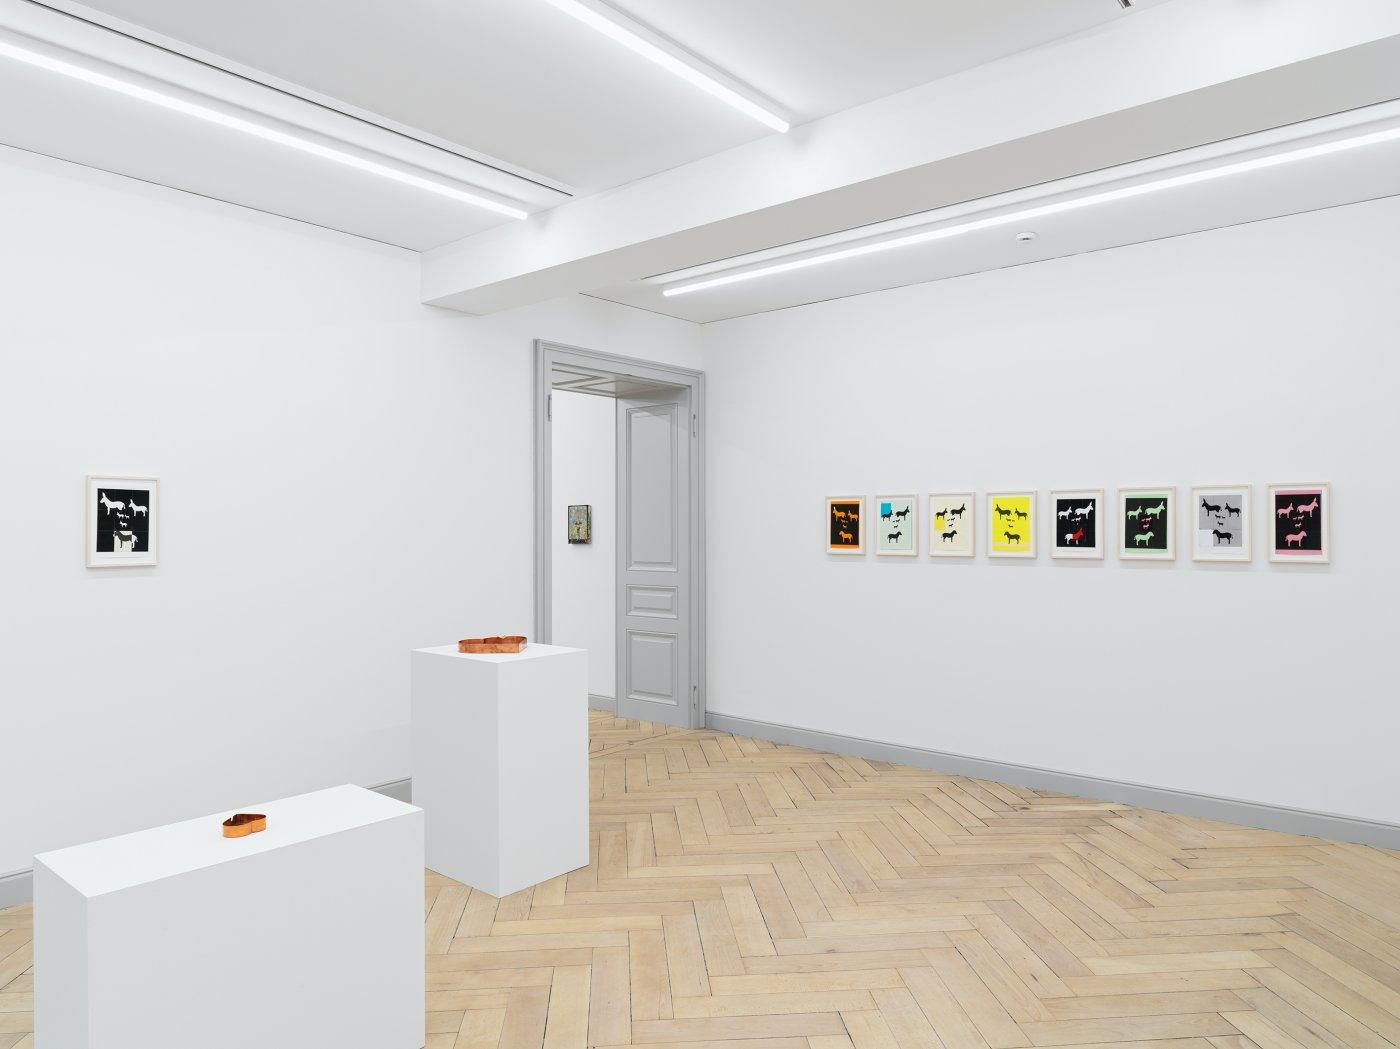 Galerie Eva Presenhuber Valentin Carron 2020 2